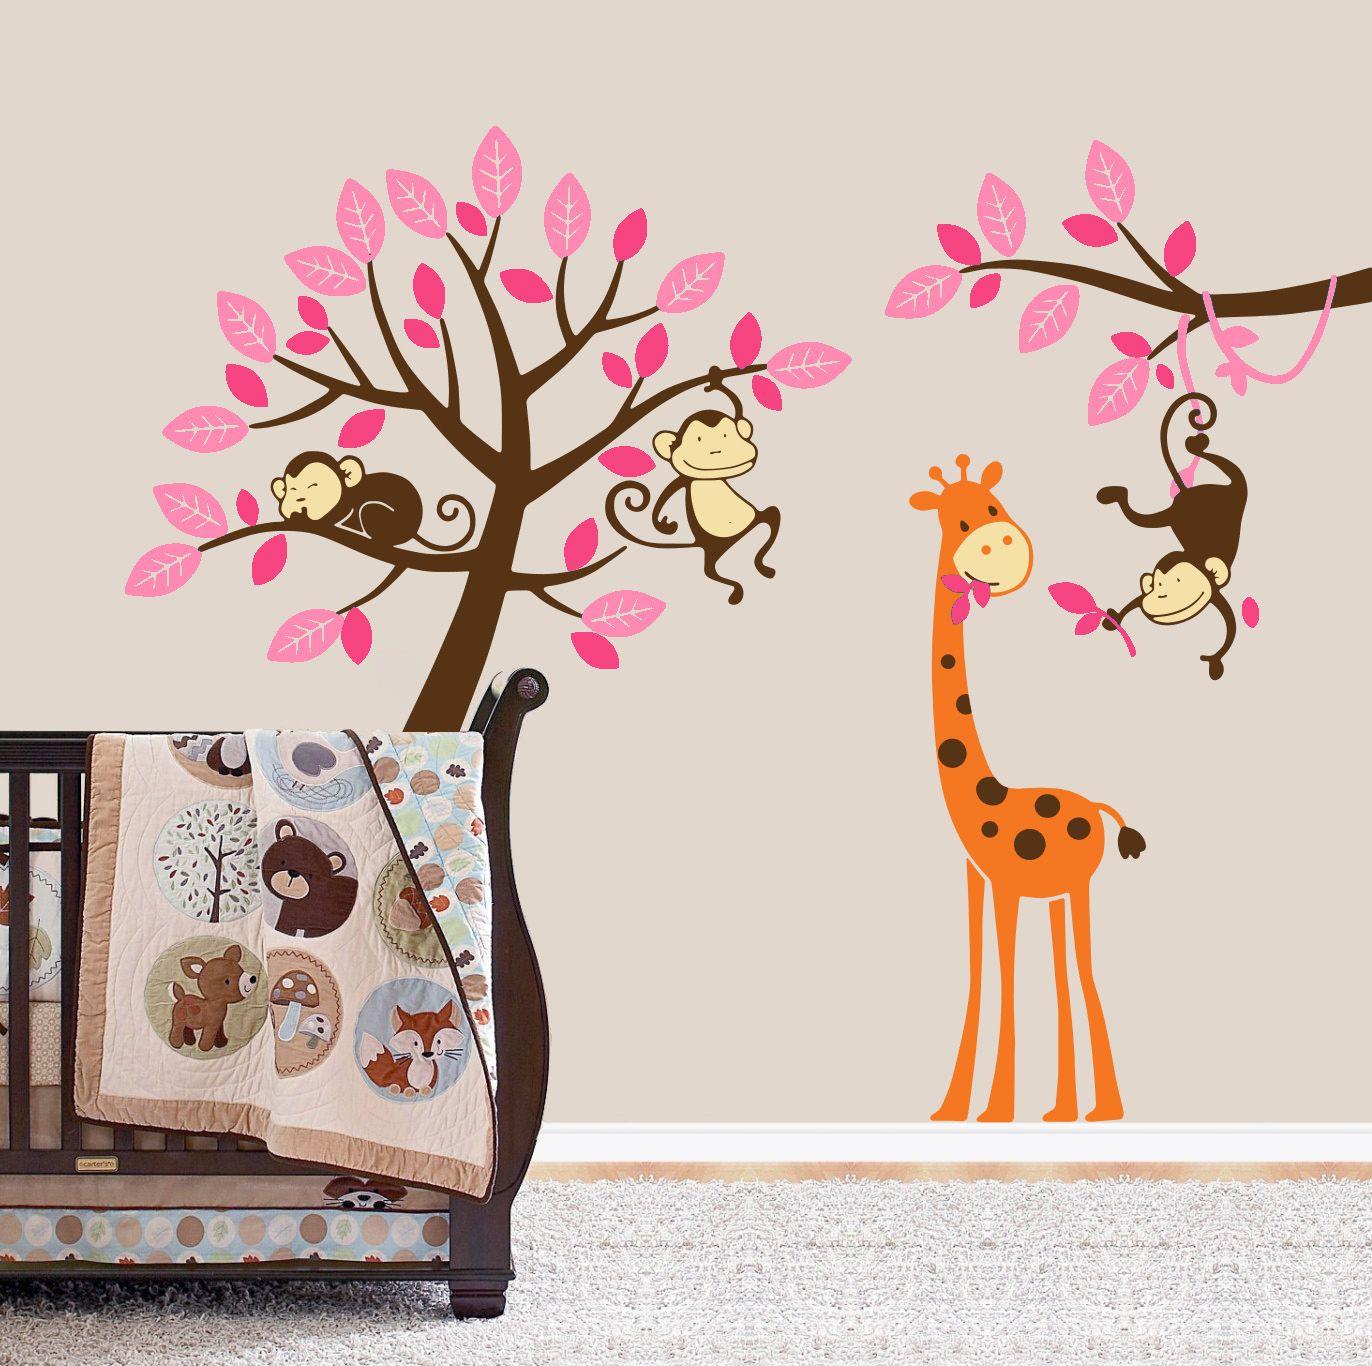 Muurstickers babykamer boom uil: ... dieren aapjes uiltjes ...